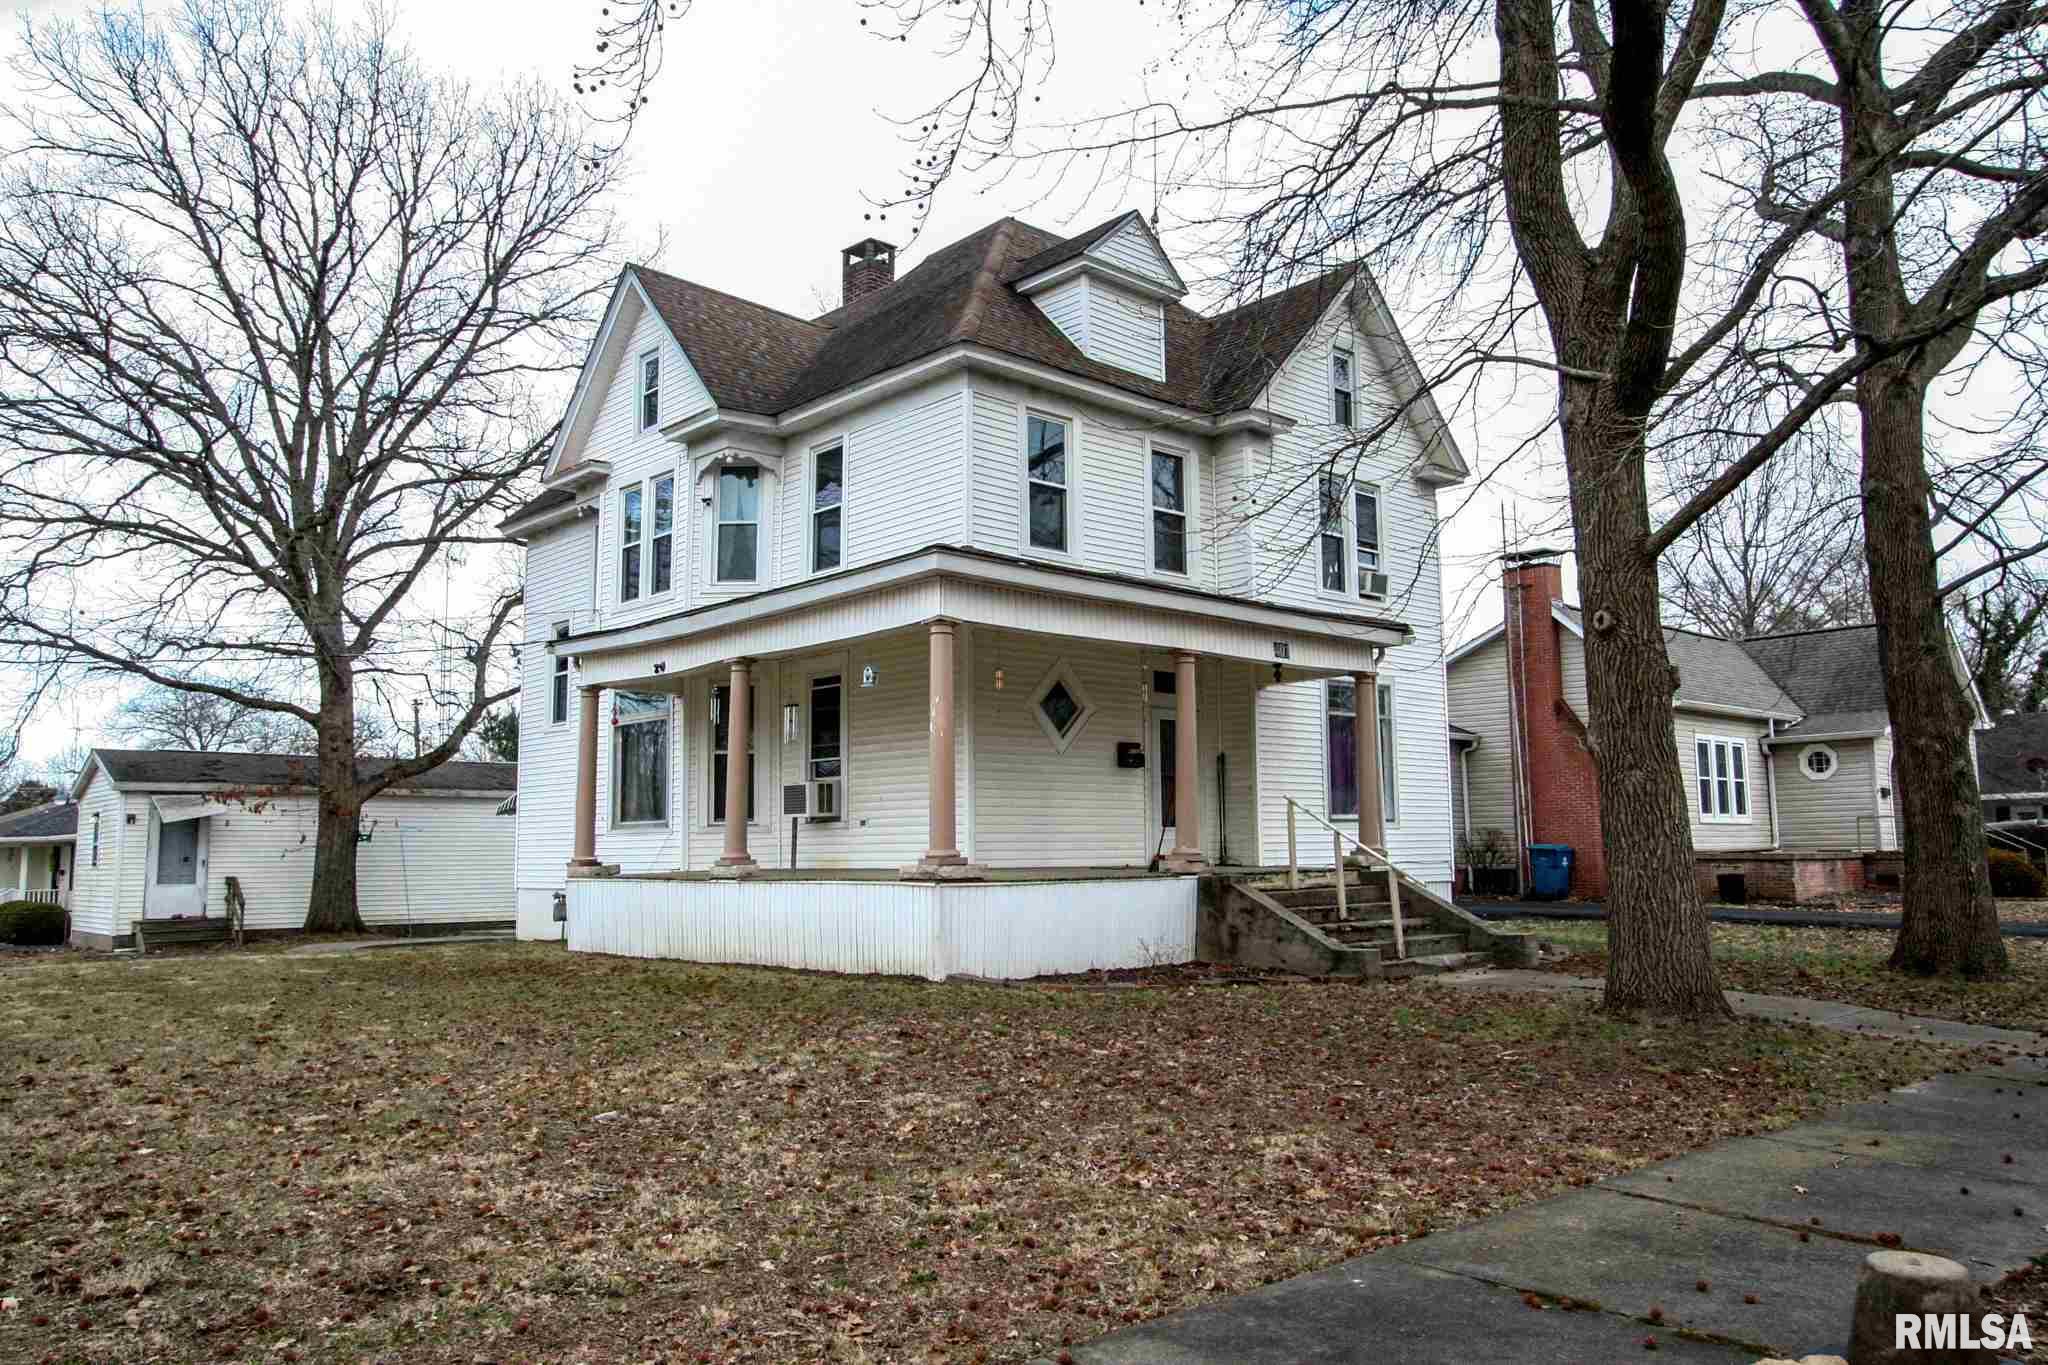 401 S WALNUT Property Photo - Carmi, IL real estate listing